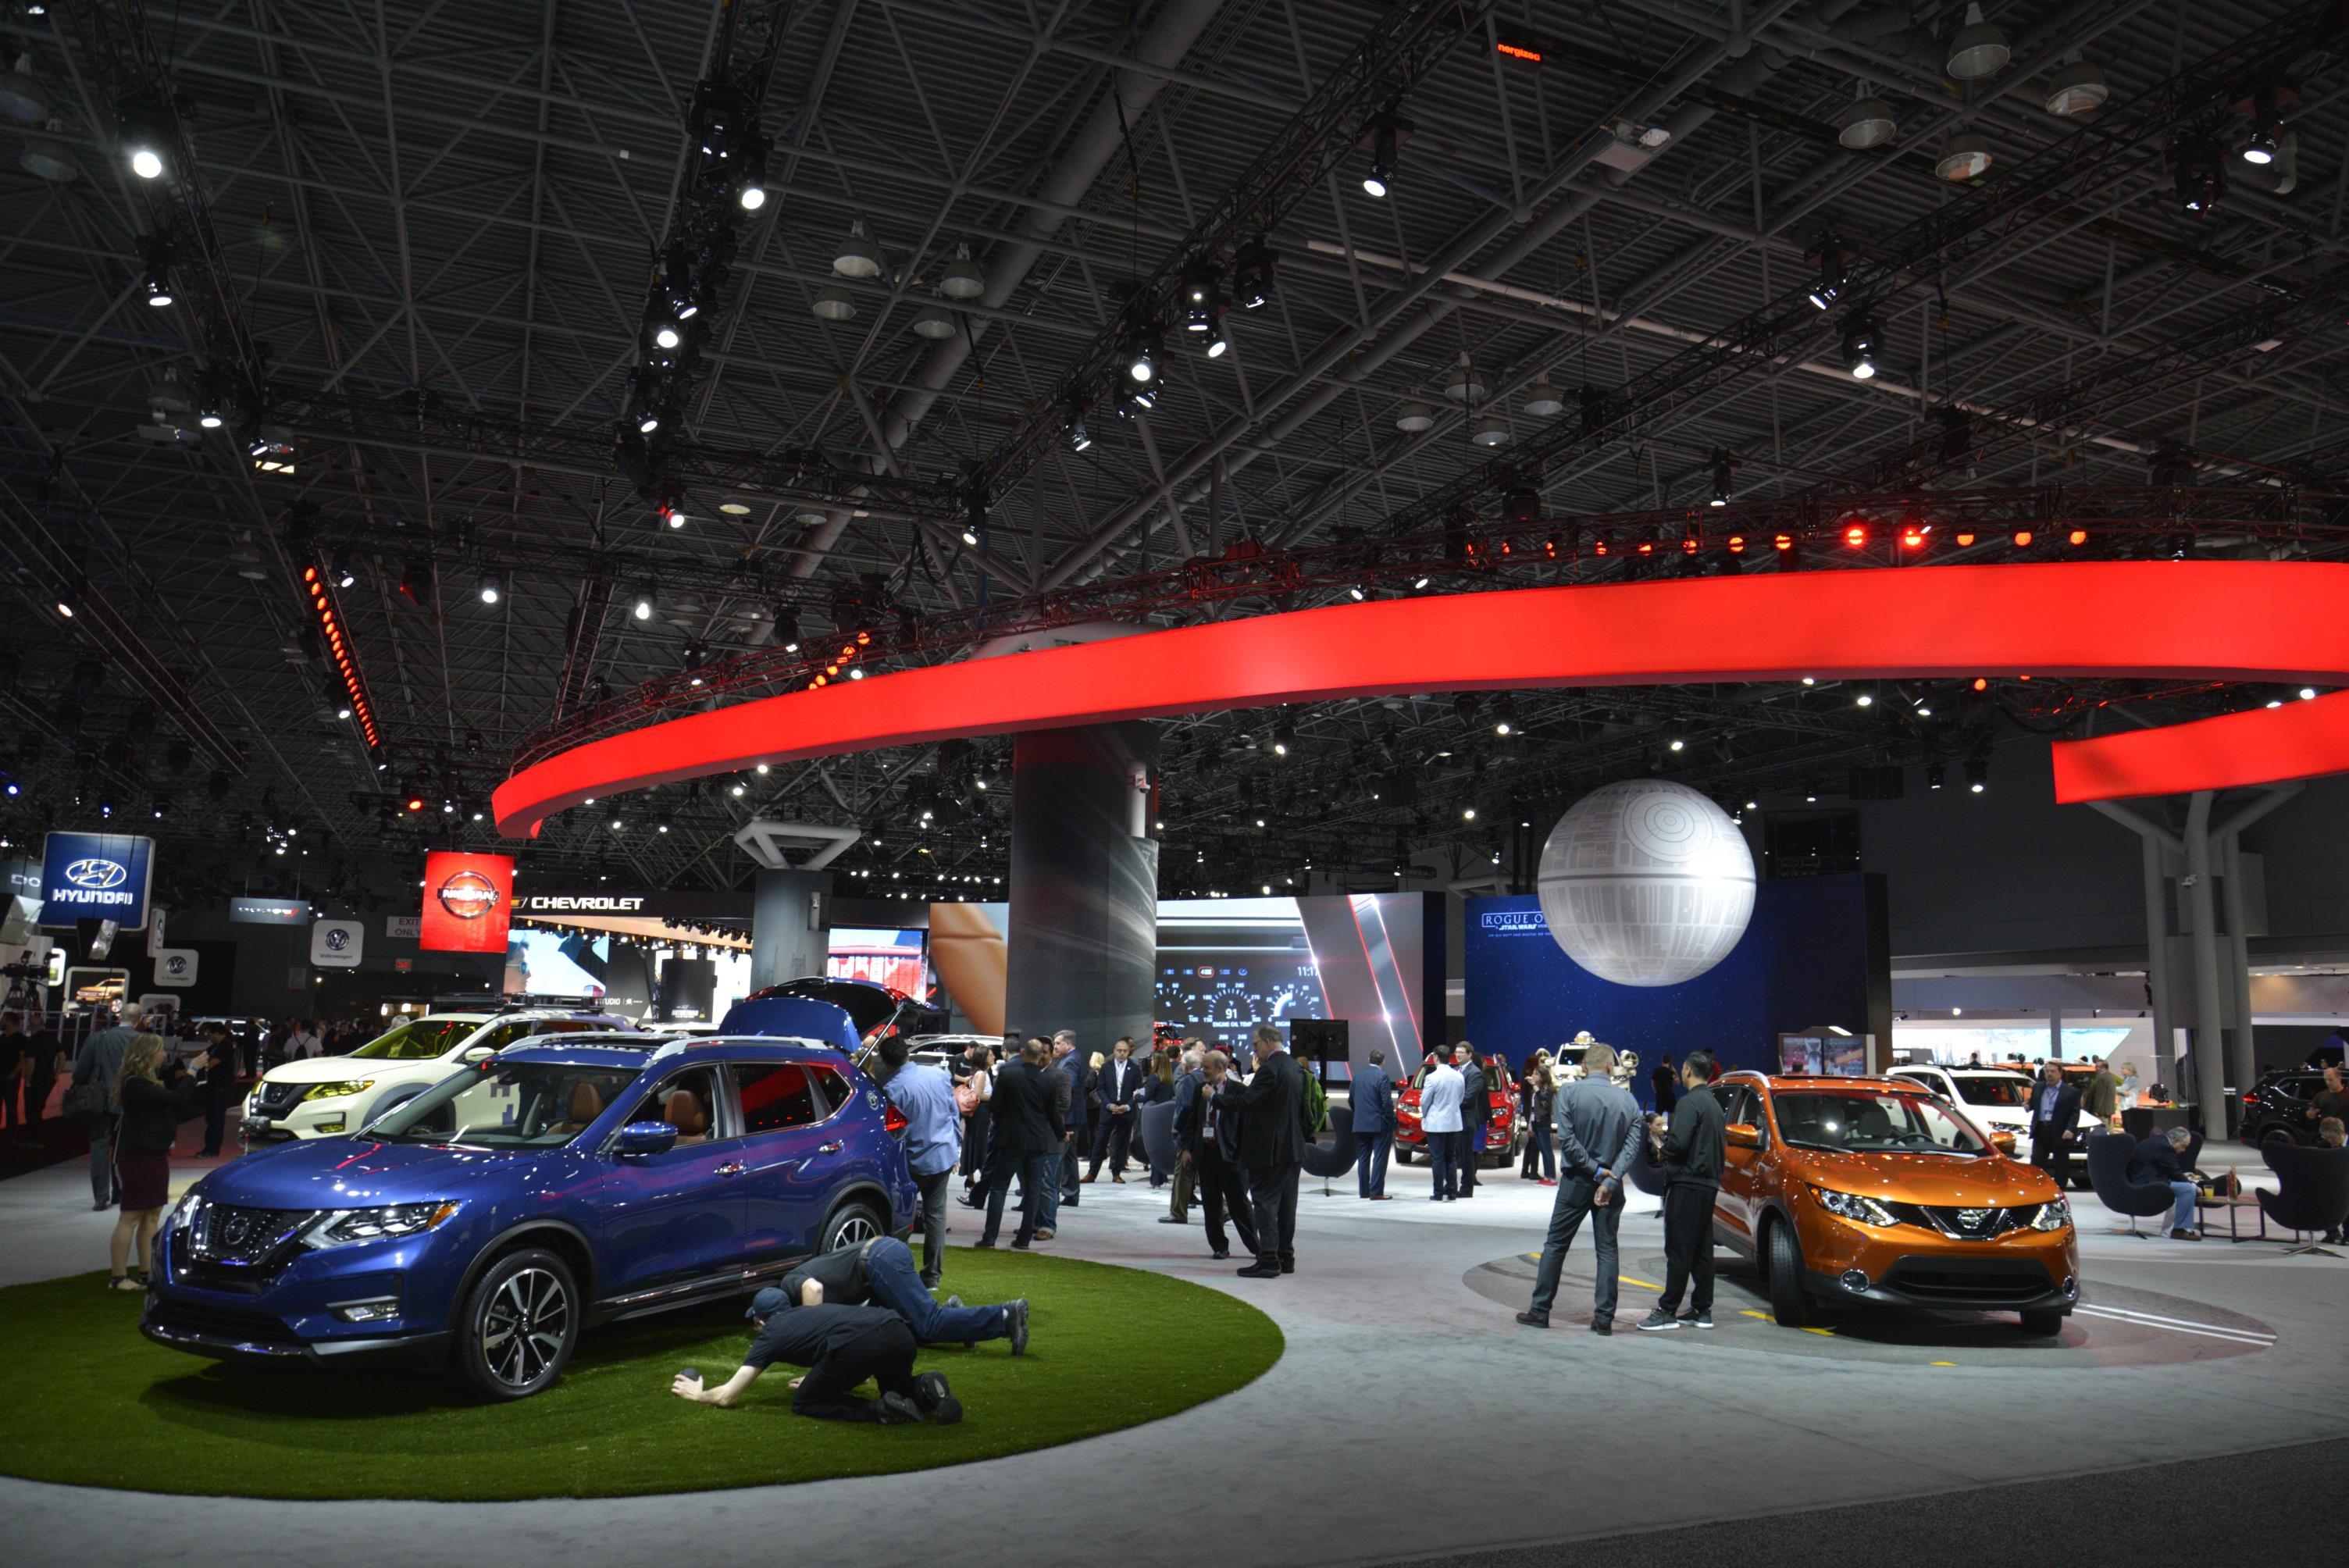 New York Auto Show 2017 (1)